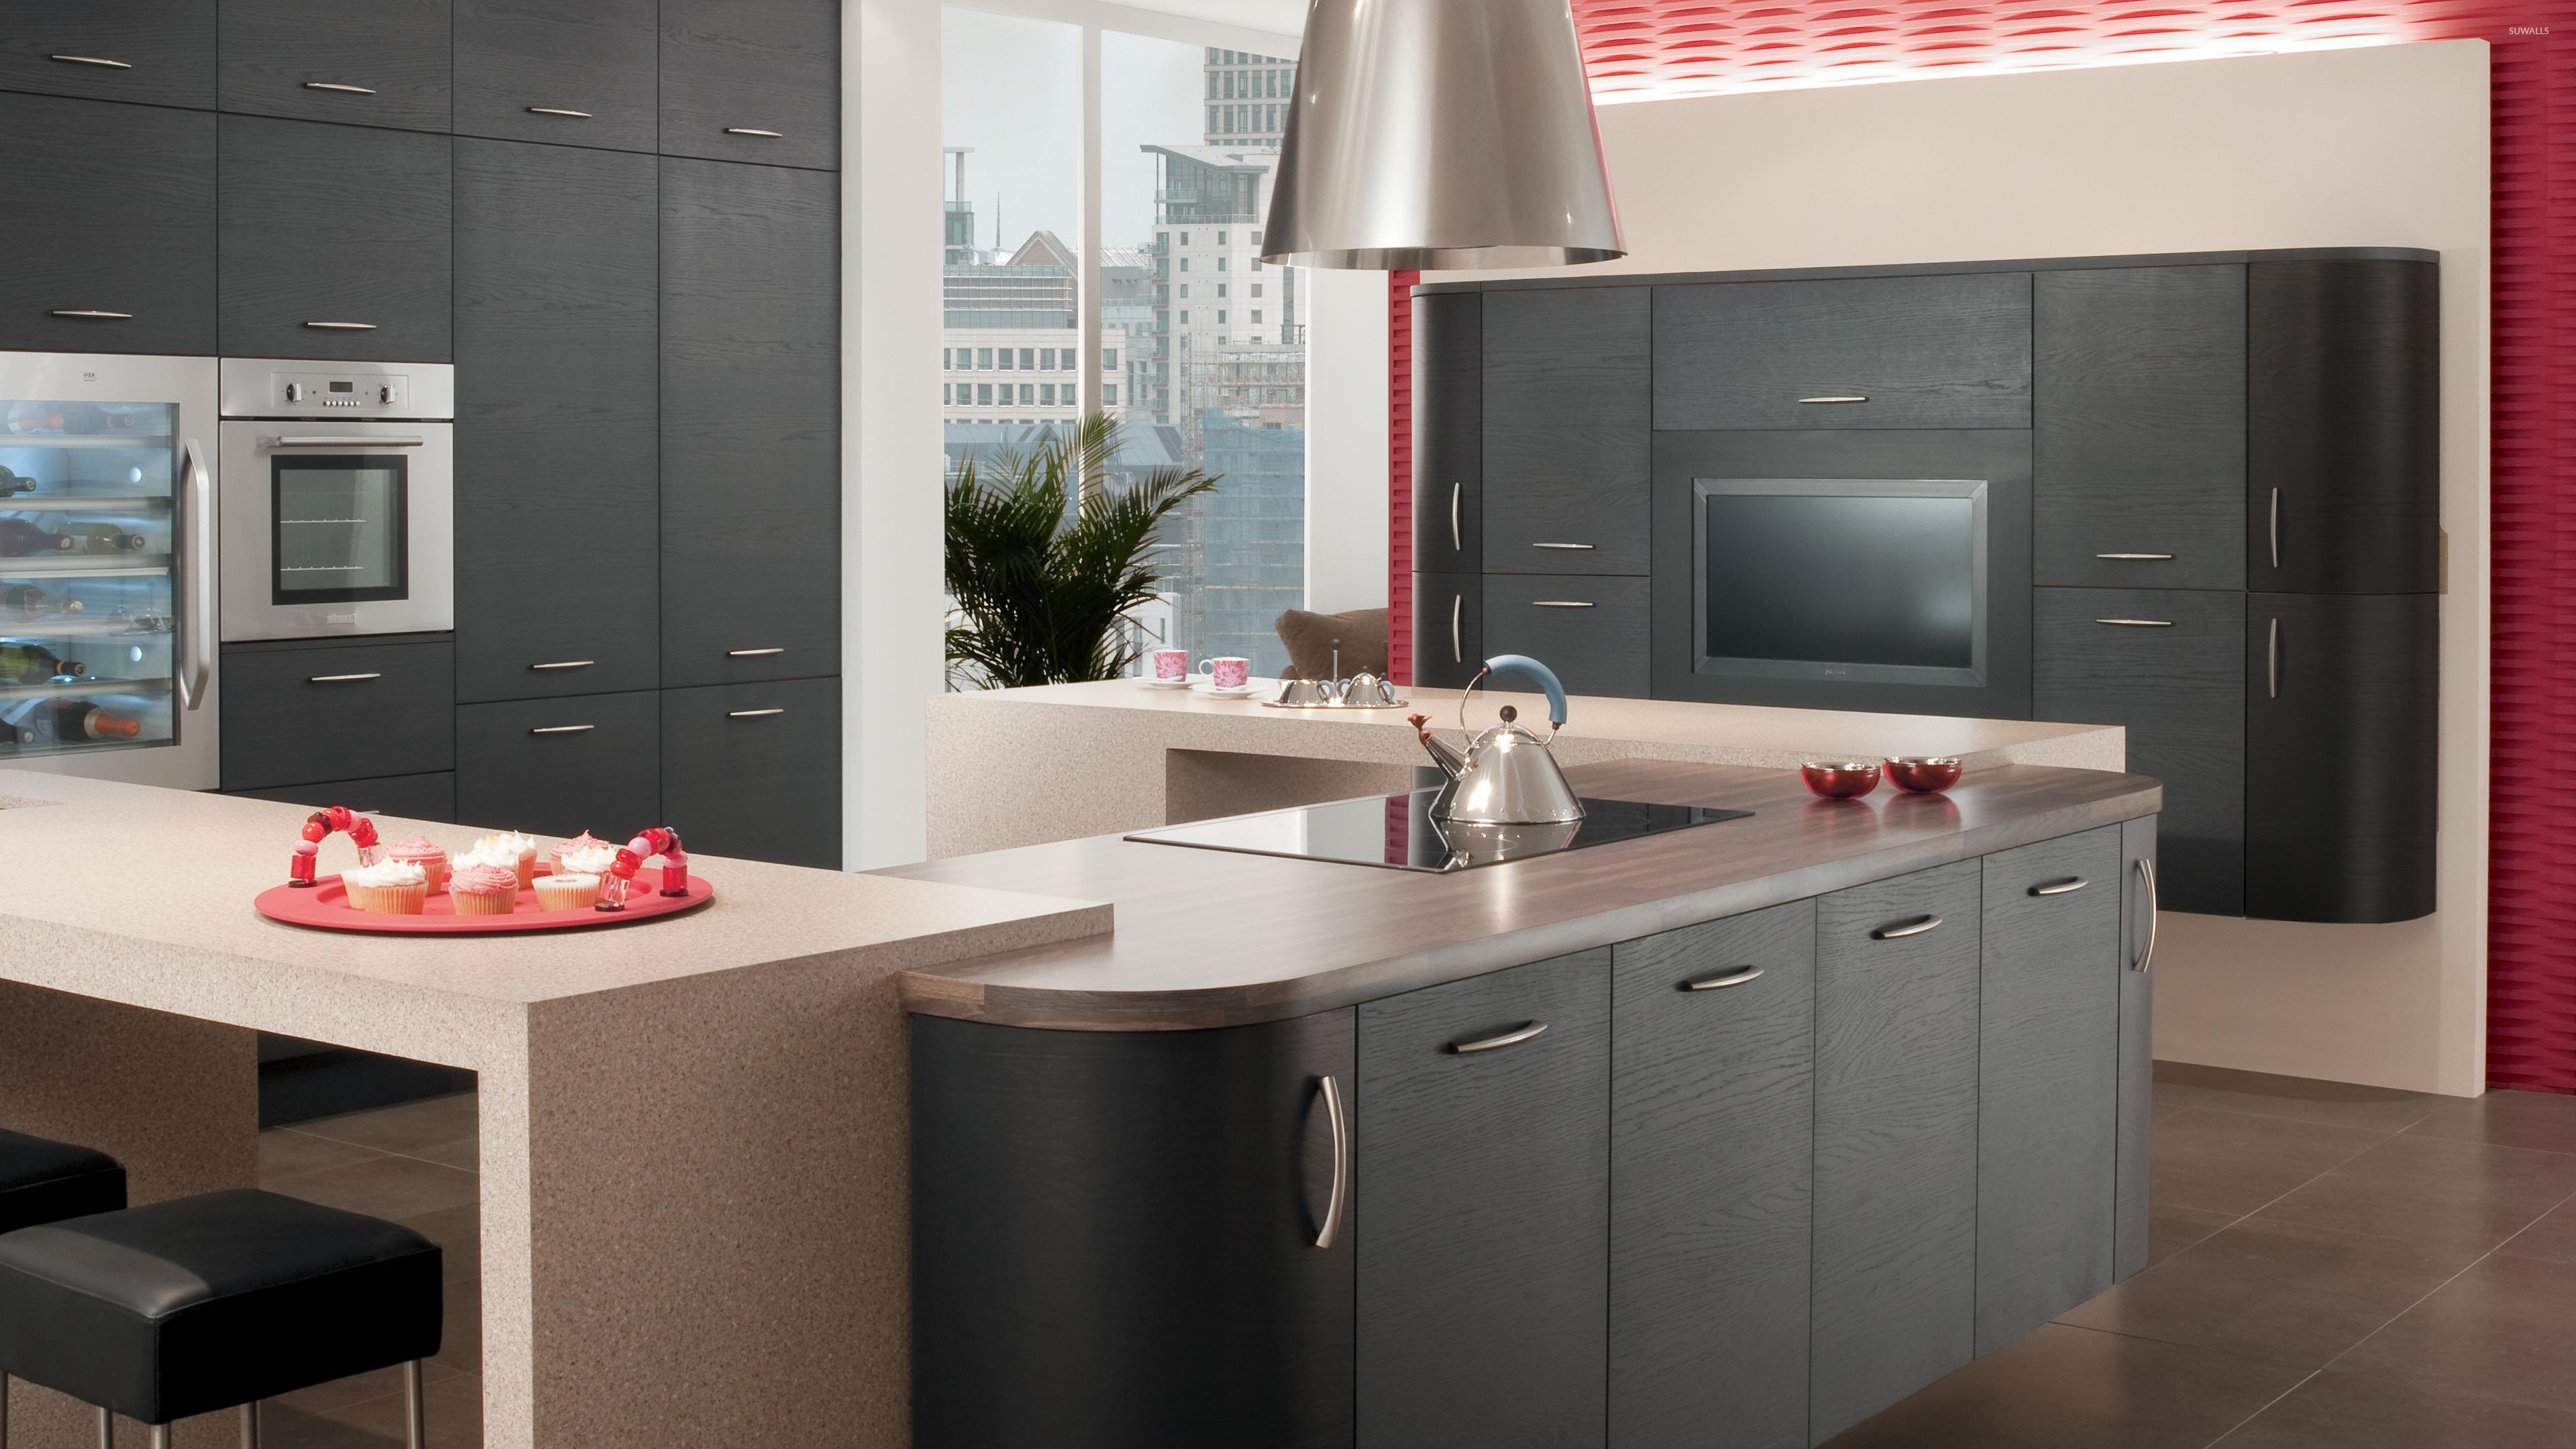 Minimalistic gray kitchen design wallpaper photography for Grey kitchen wallpaper